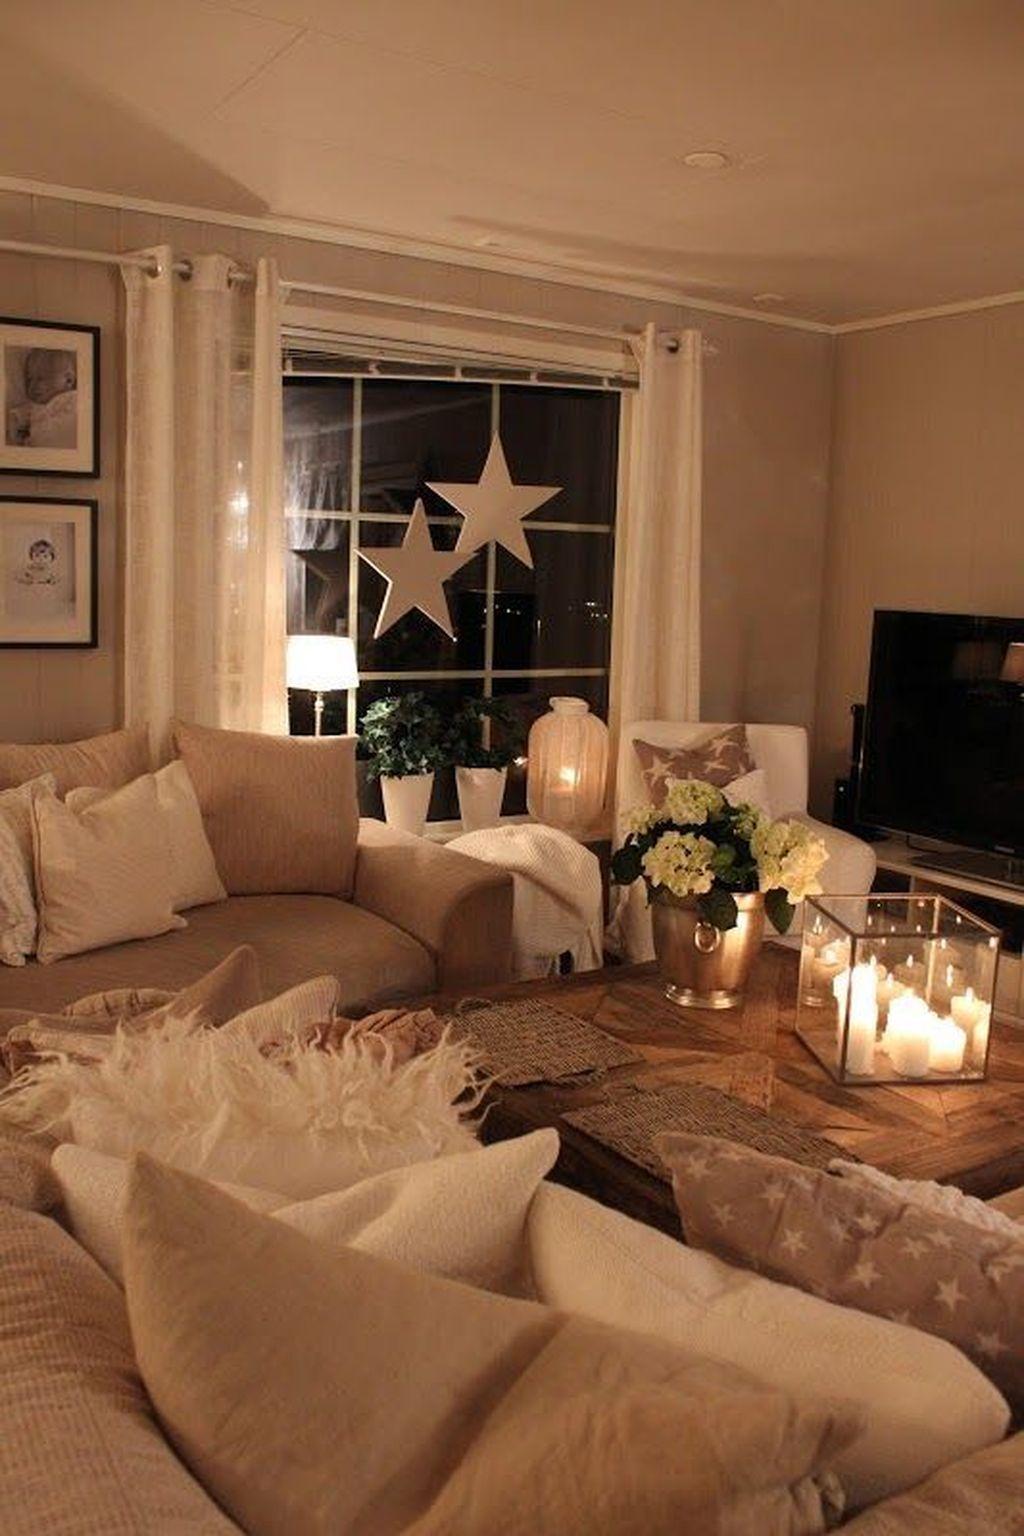 35 Cozy Livingroom Ideas In 2020 Living Room Warm Rustic Living Room Design Cosy Living Room